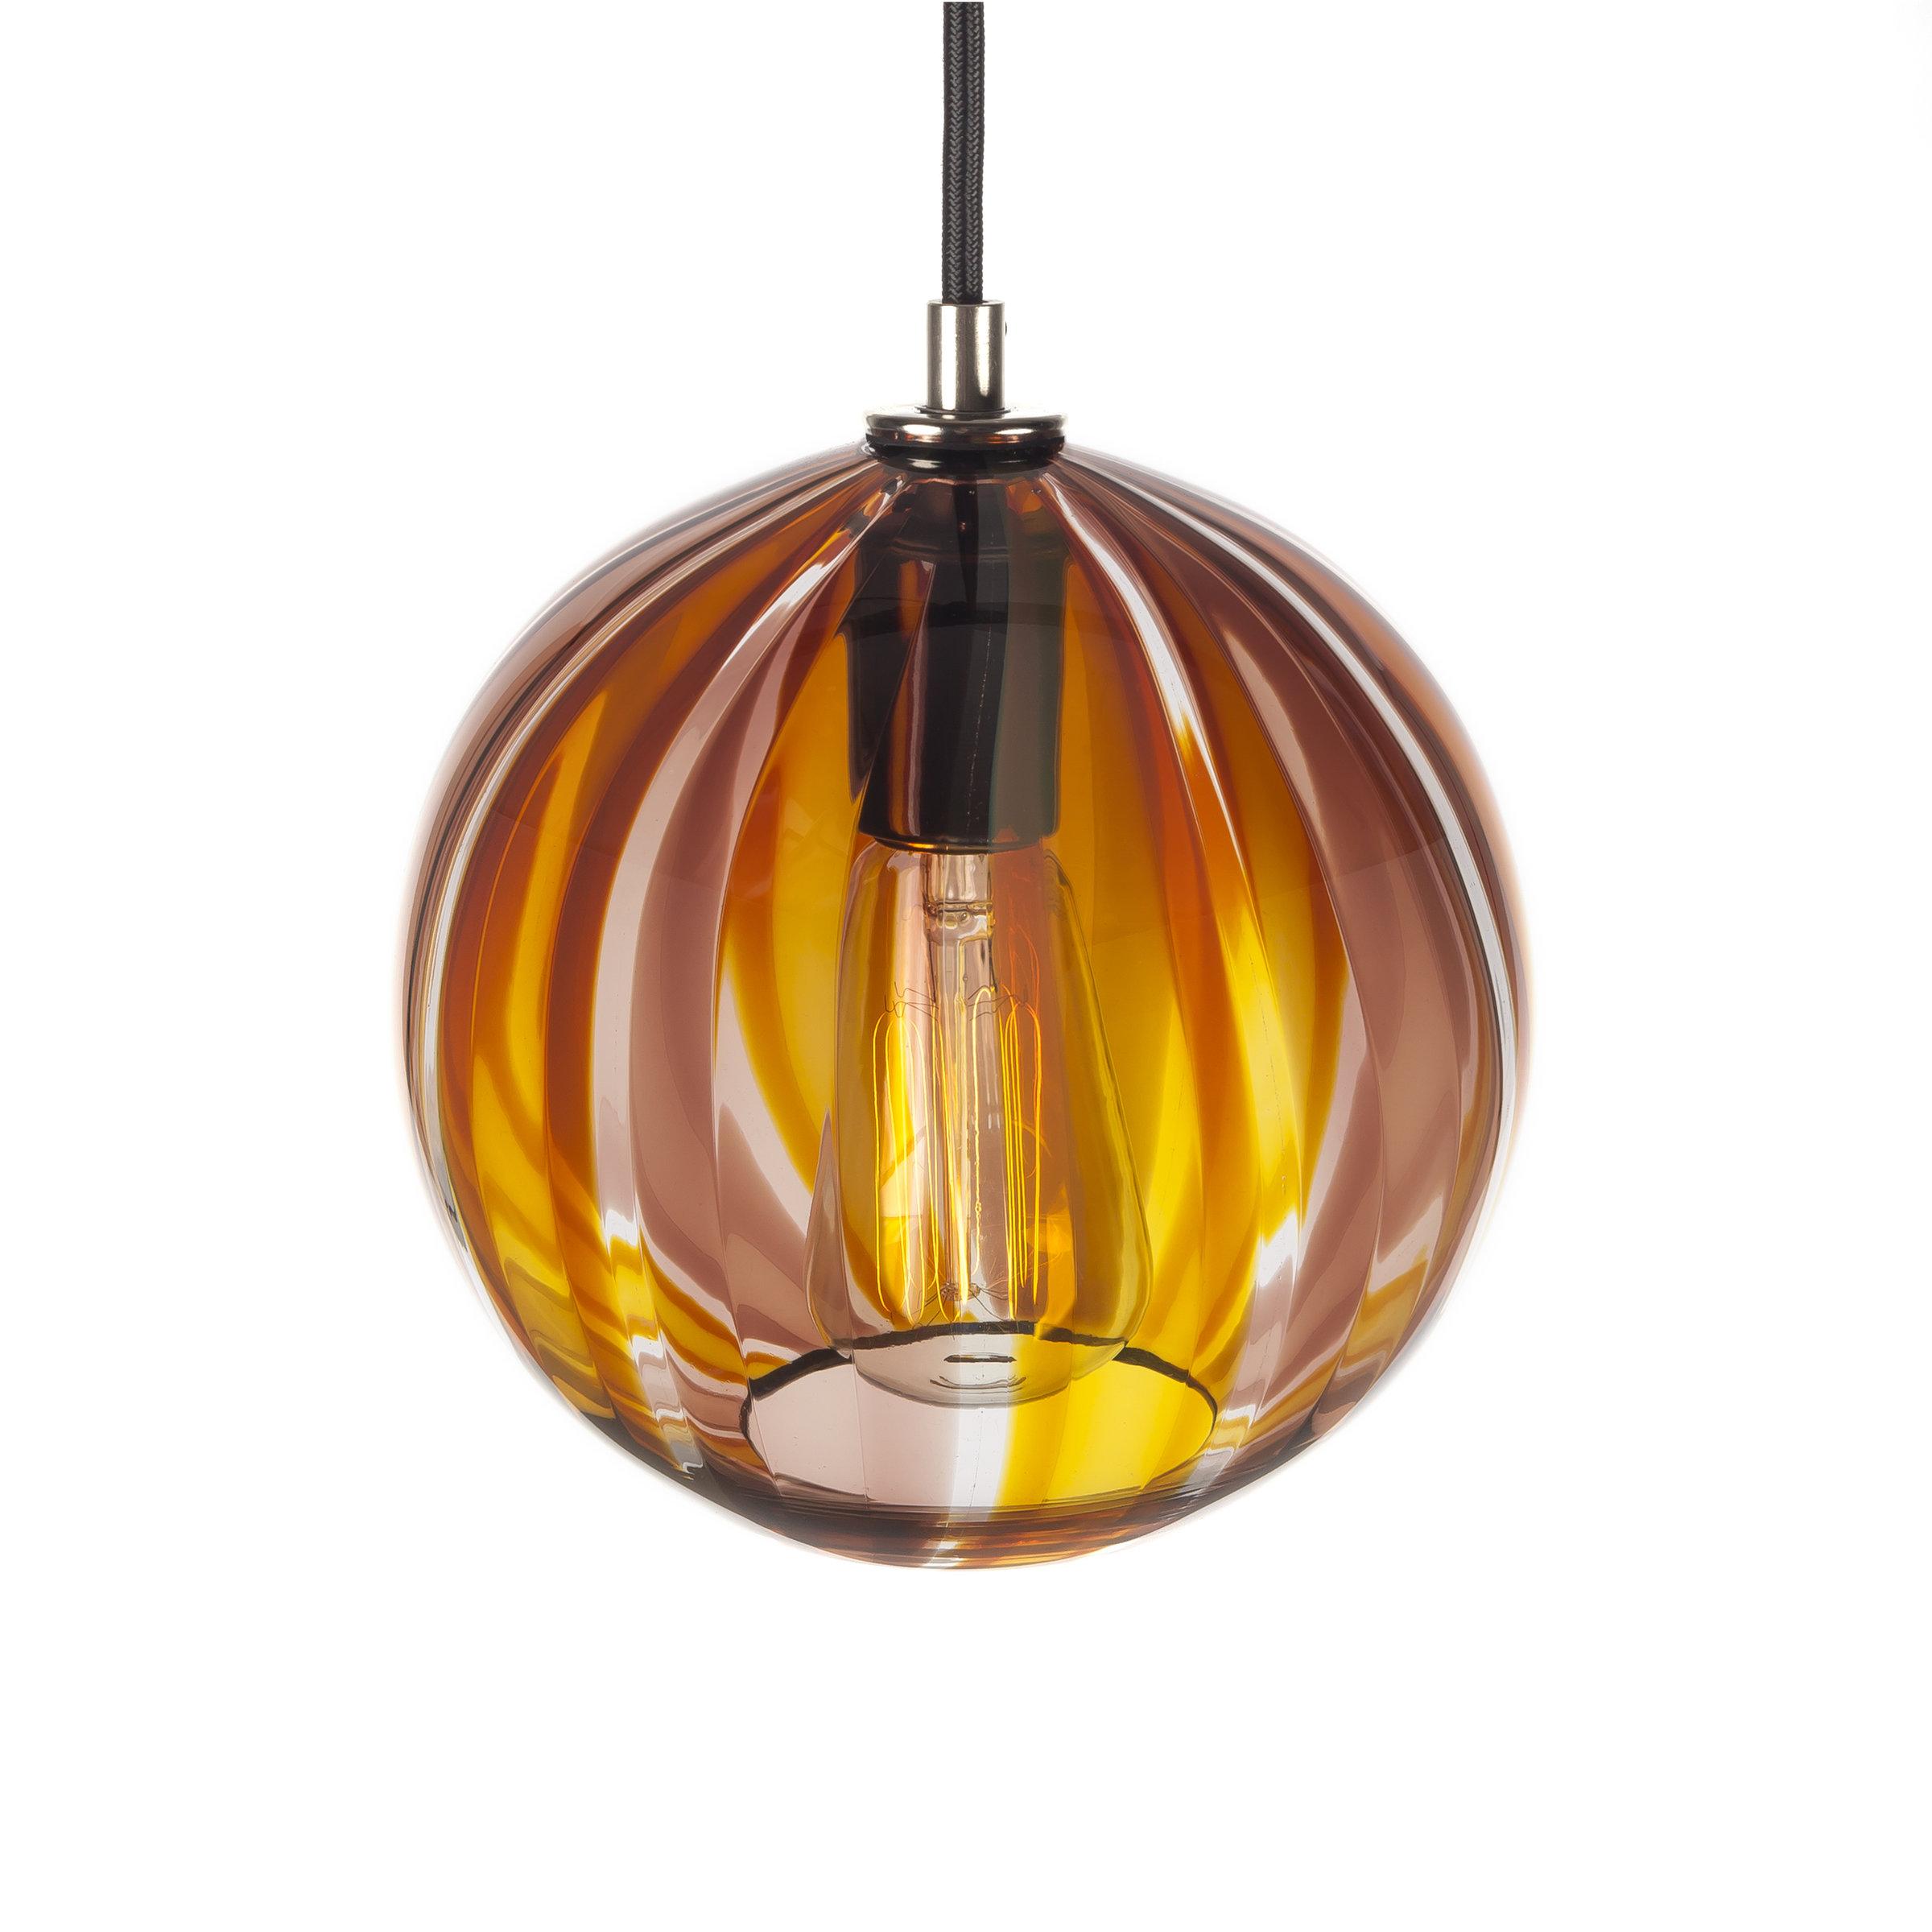 beach house pendant by tyler kimball art glass pendant lamp artful home